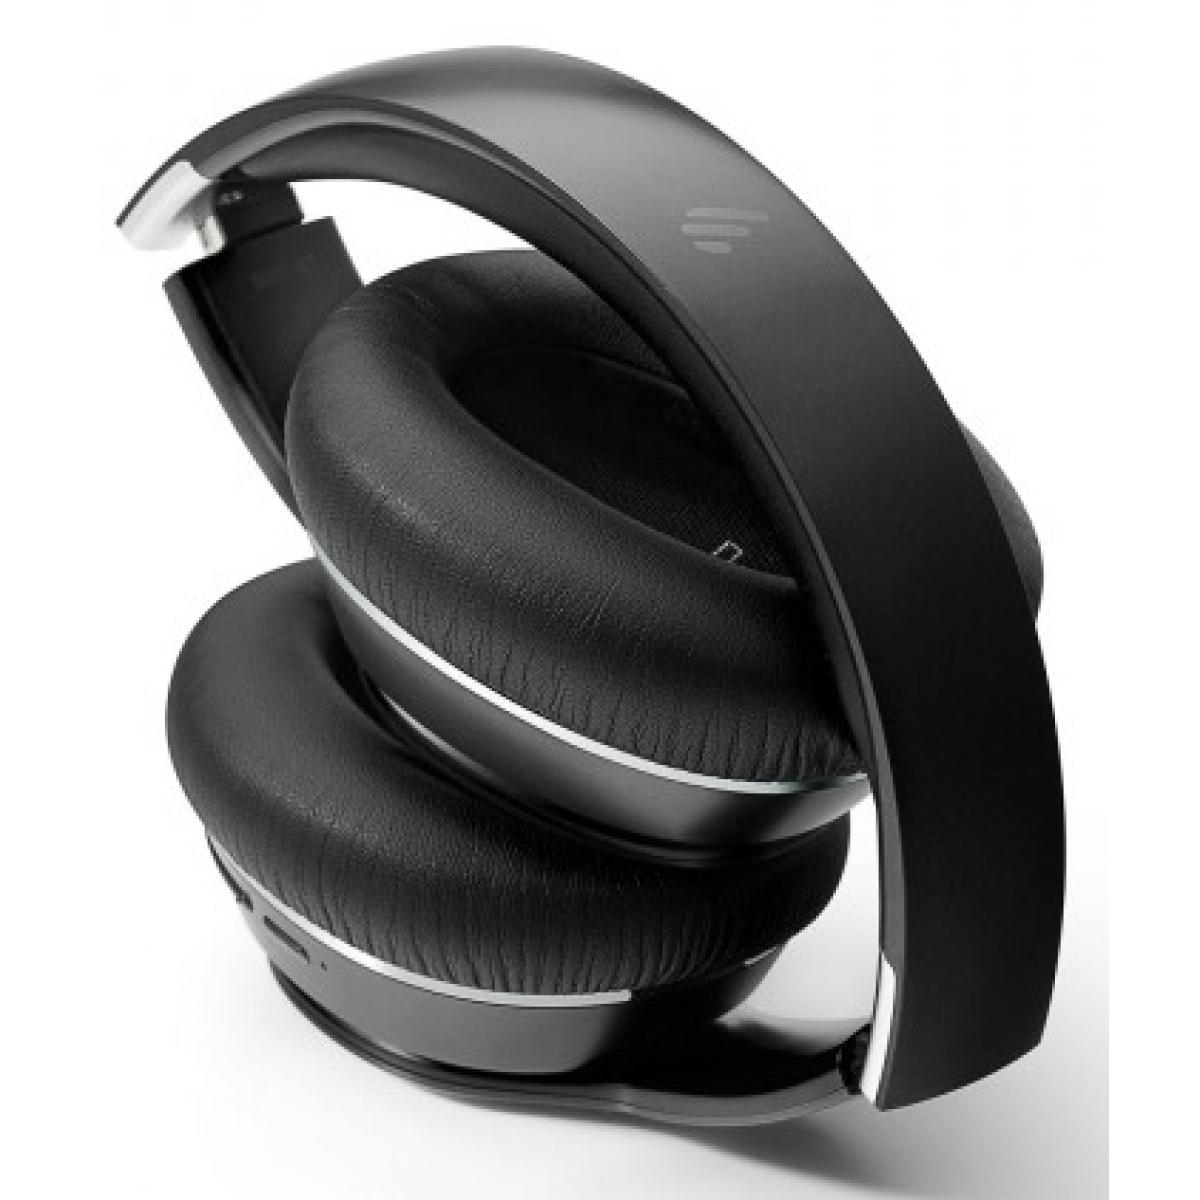 Headset Gamer Edifier W820BT, Bluetooth, Black